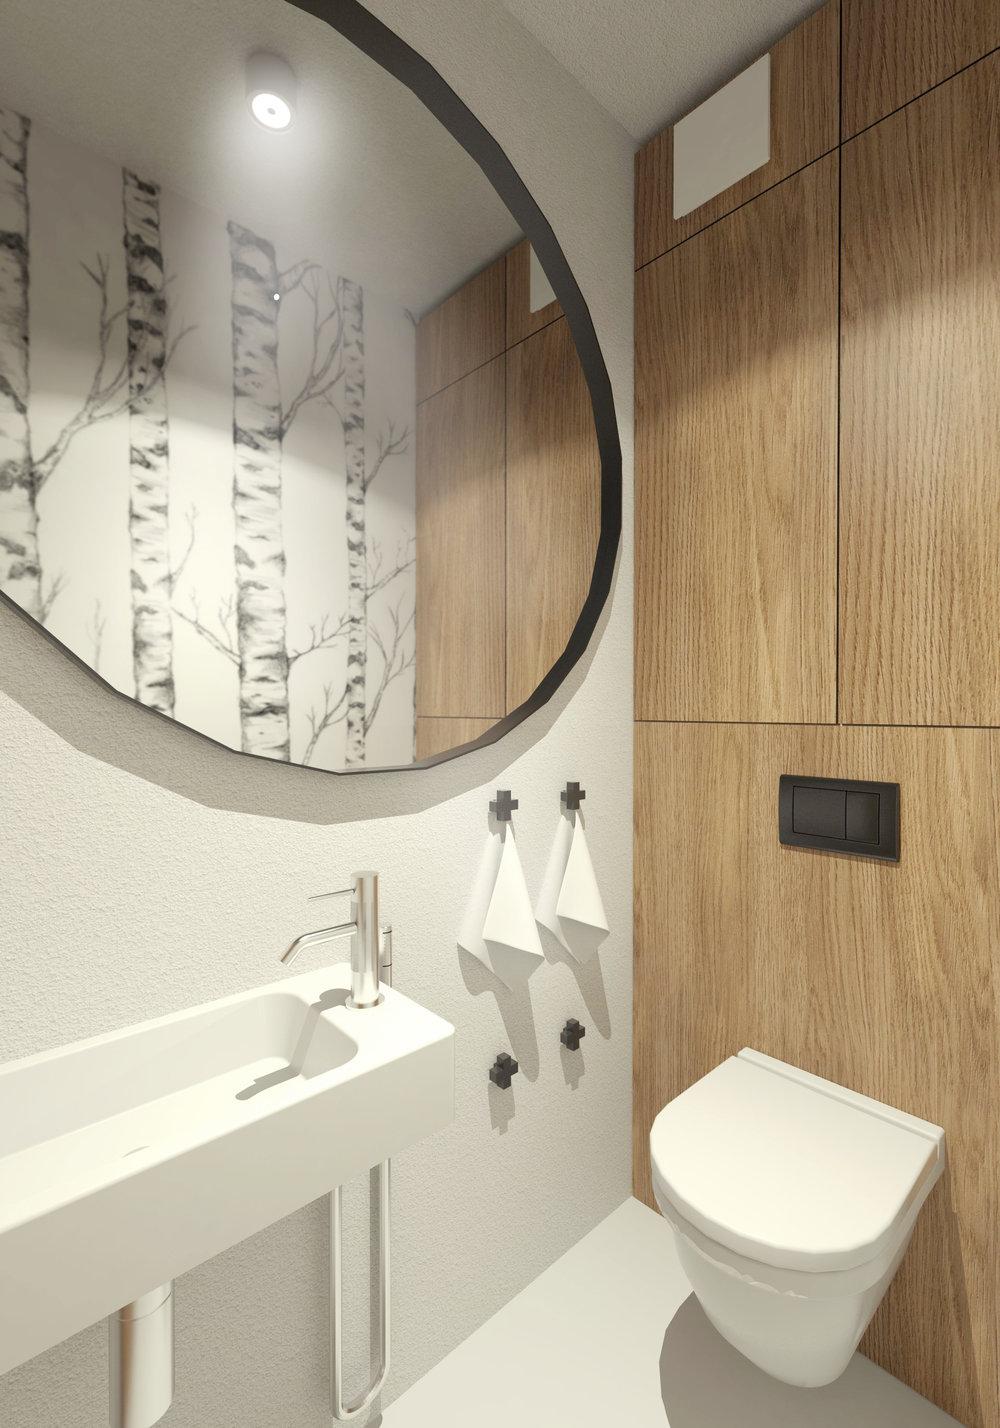 2-izbový byt_WC1.jpg